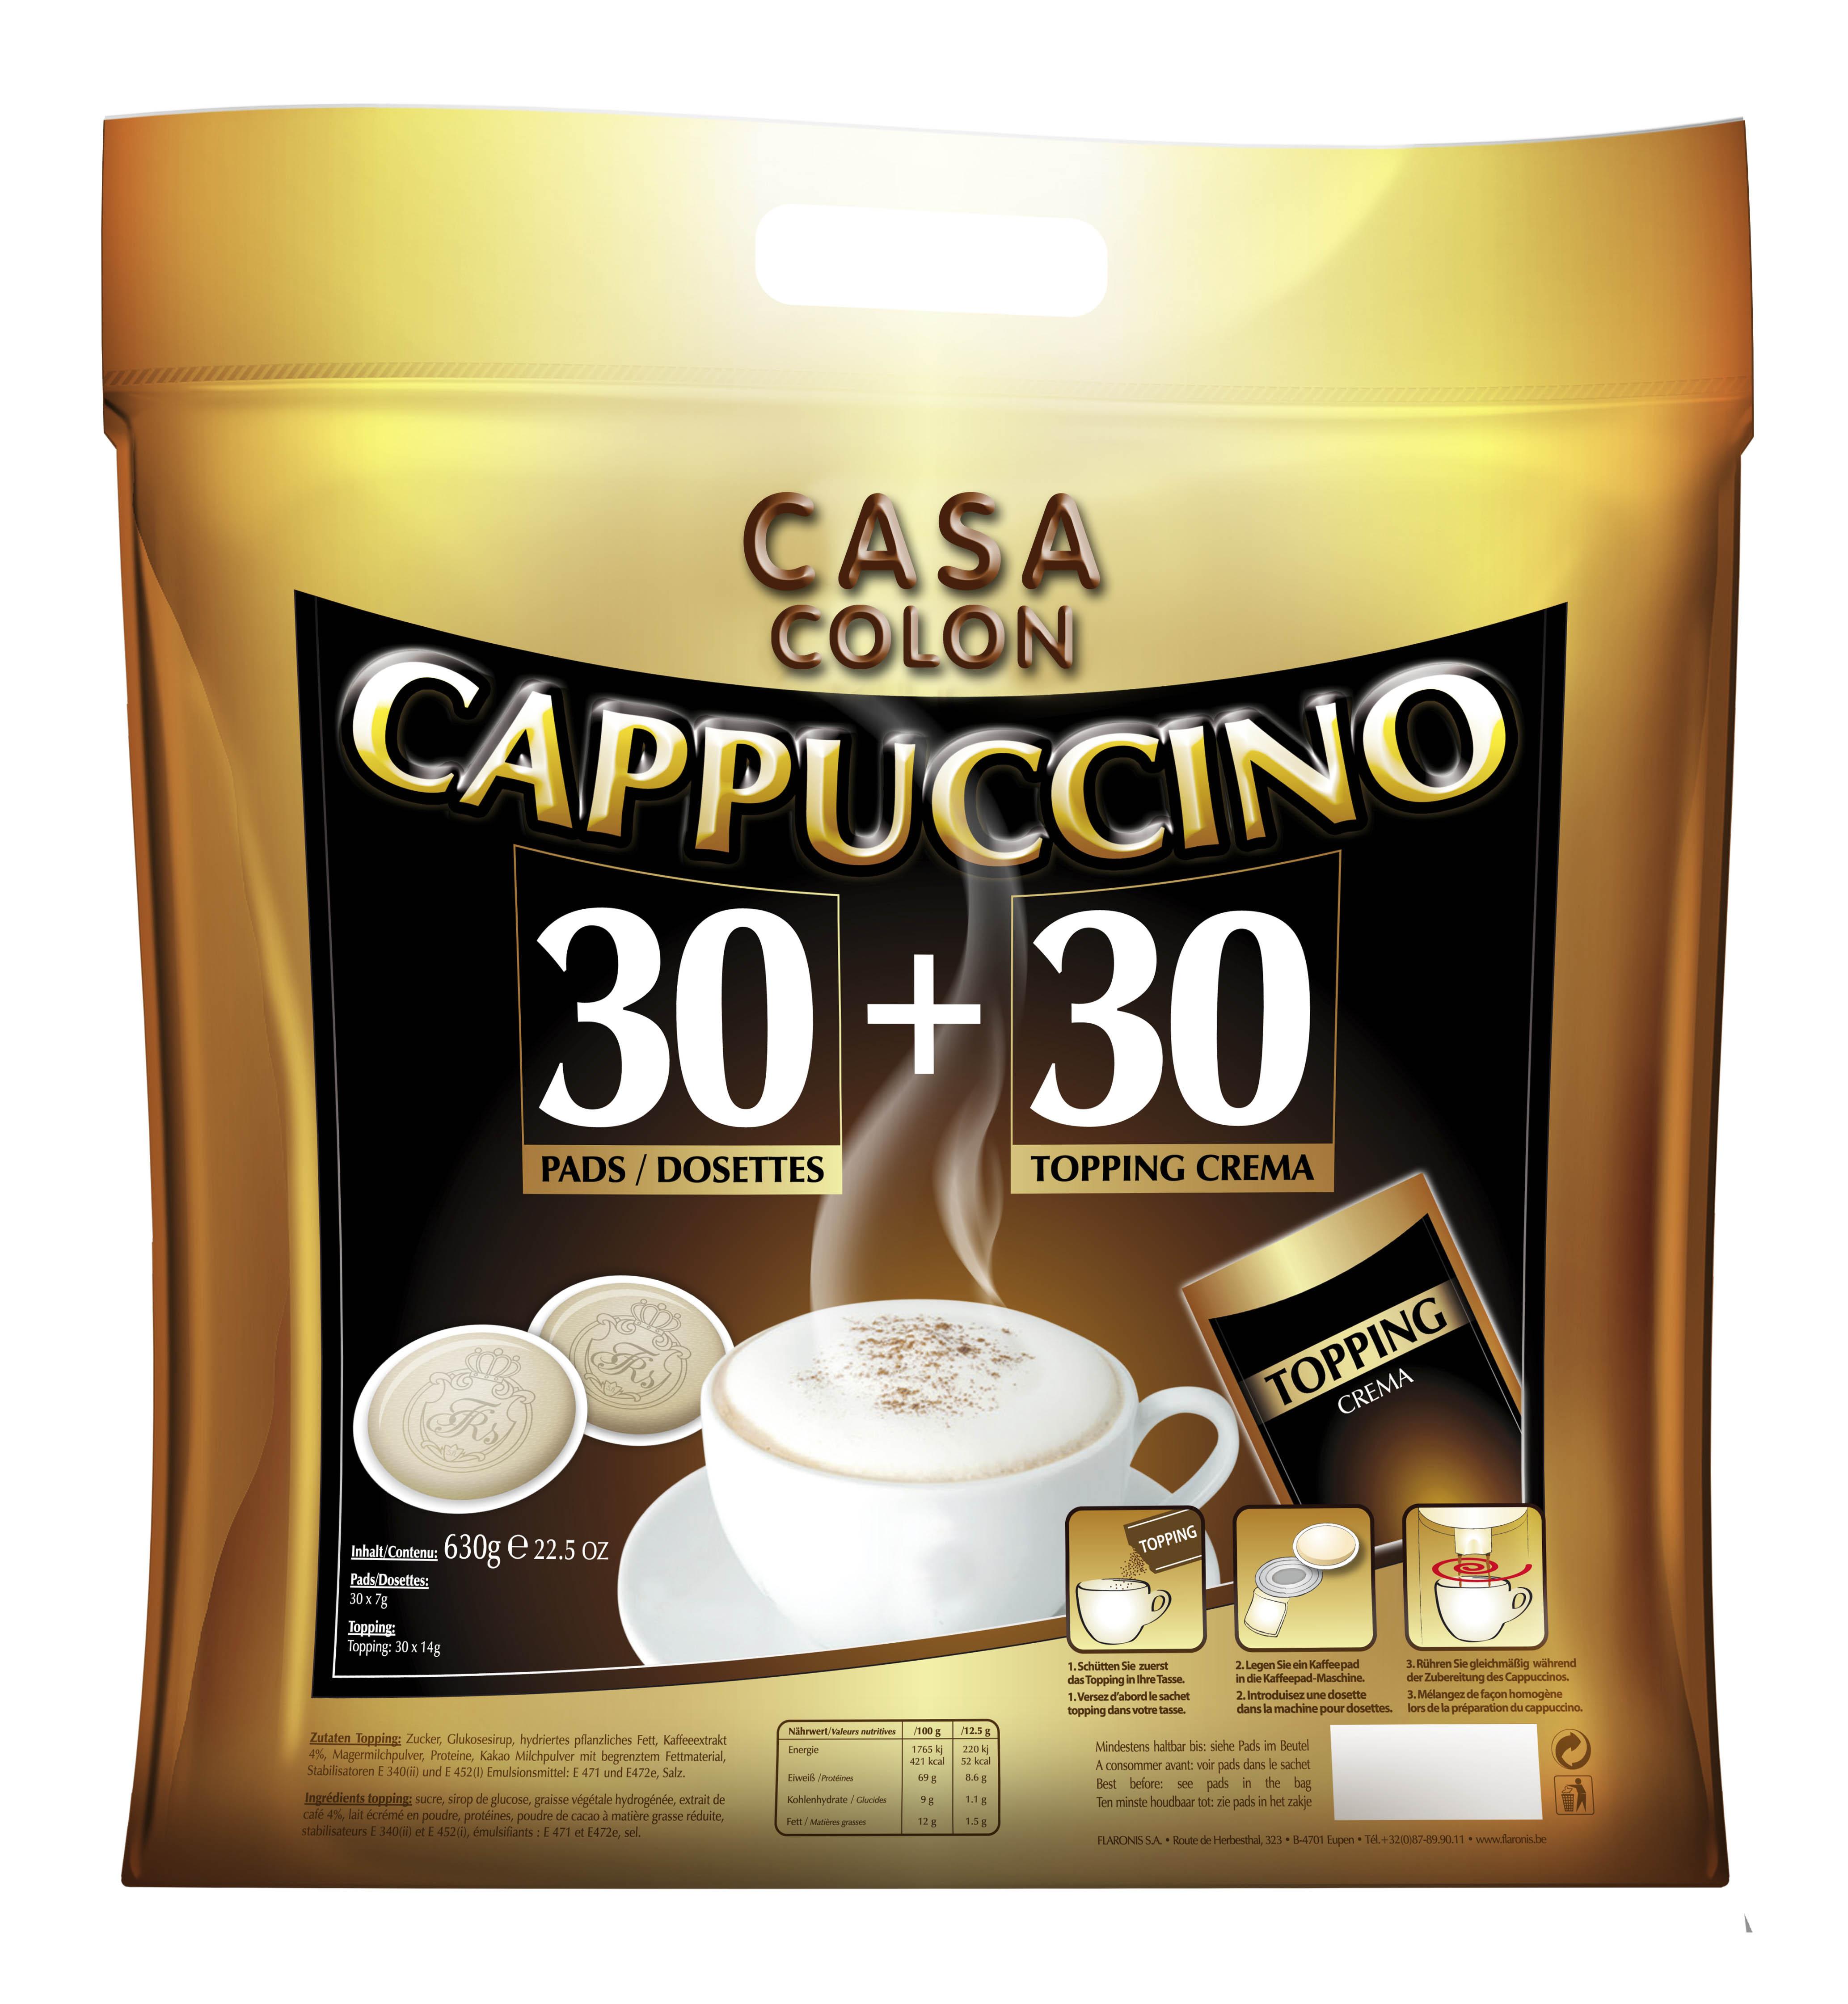 483NNA-Cappuccino30+30 NEU 2012.jpg